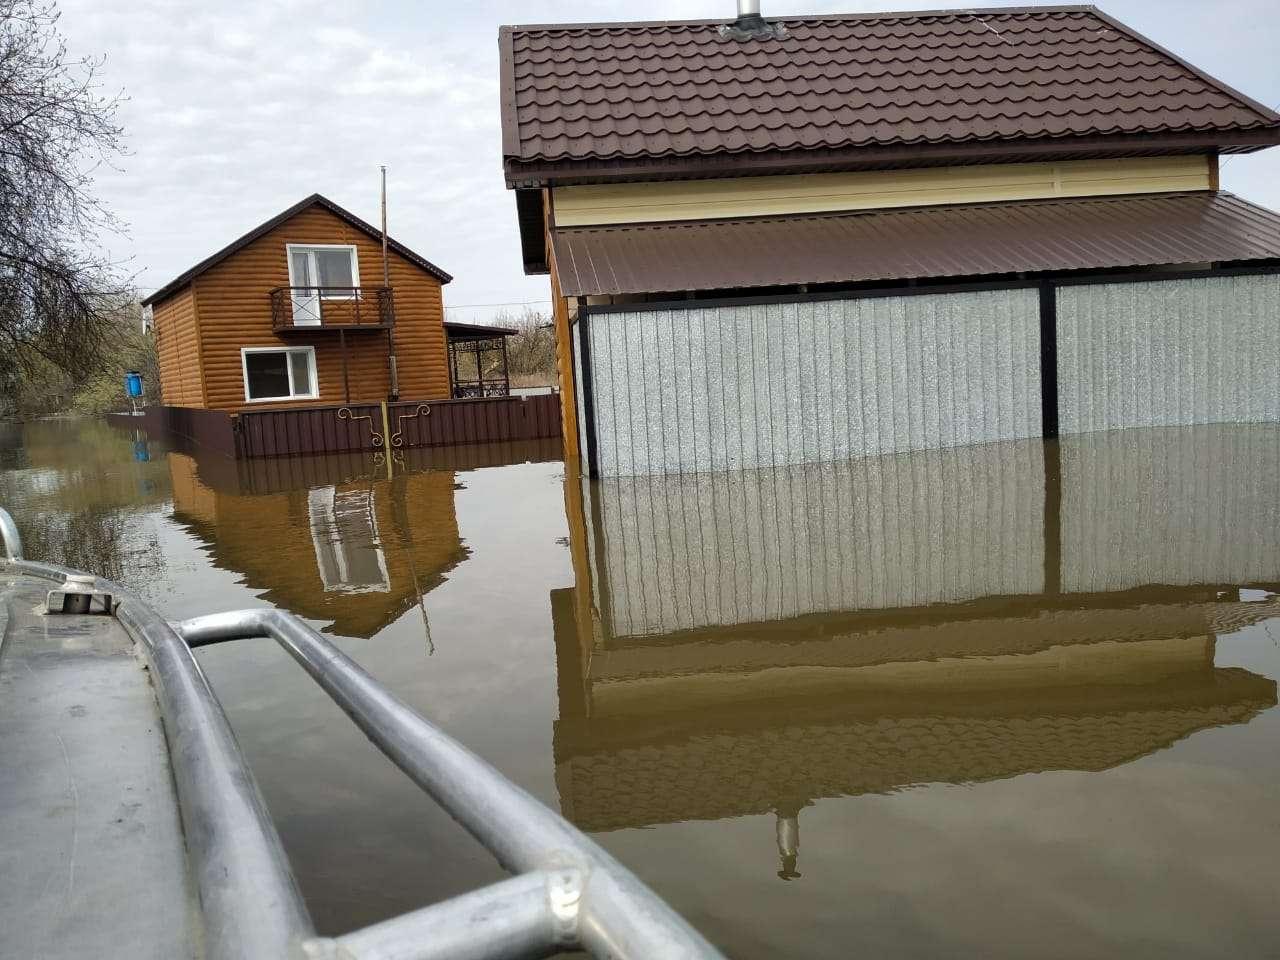 Паводки подтопили дома в Кокшетау и Петропавловске